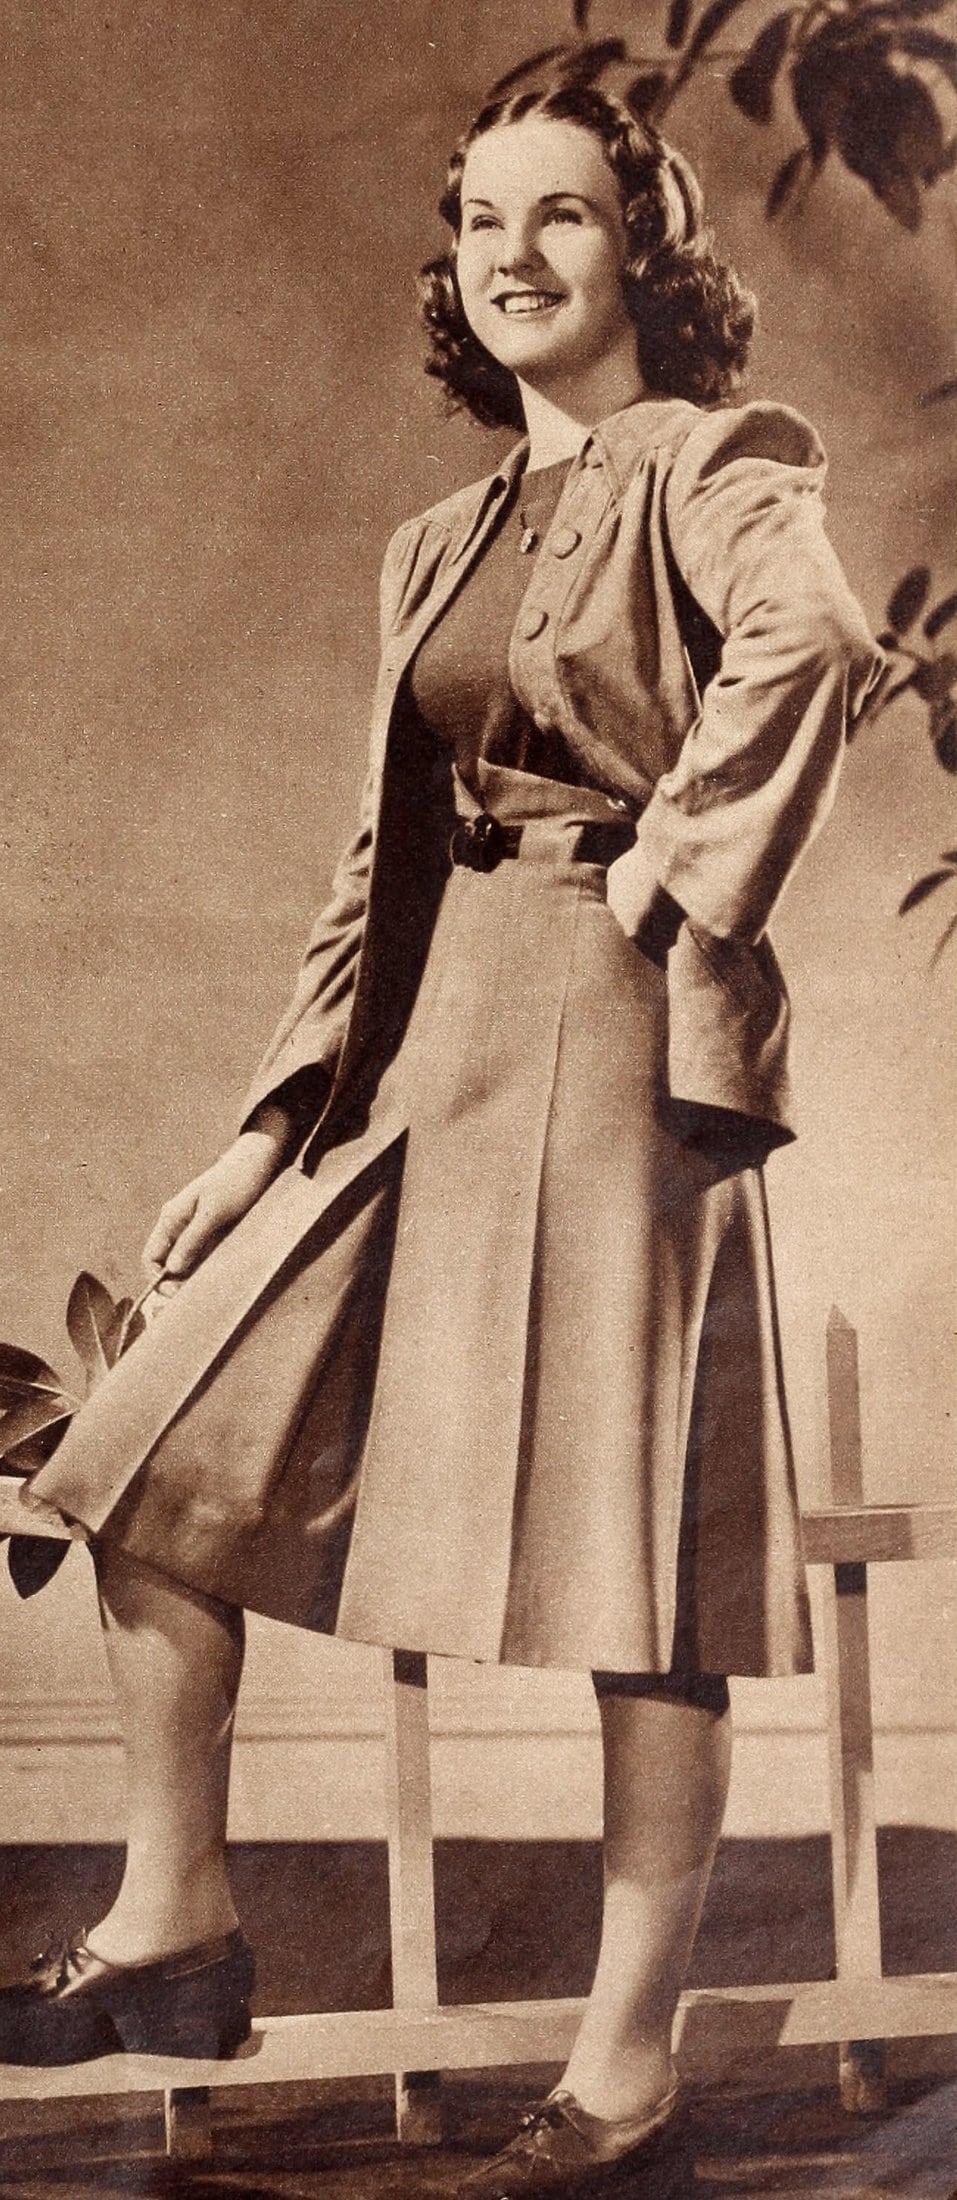 Vintage acress Deanna Durbin modeling culottes (1940)